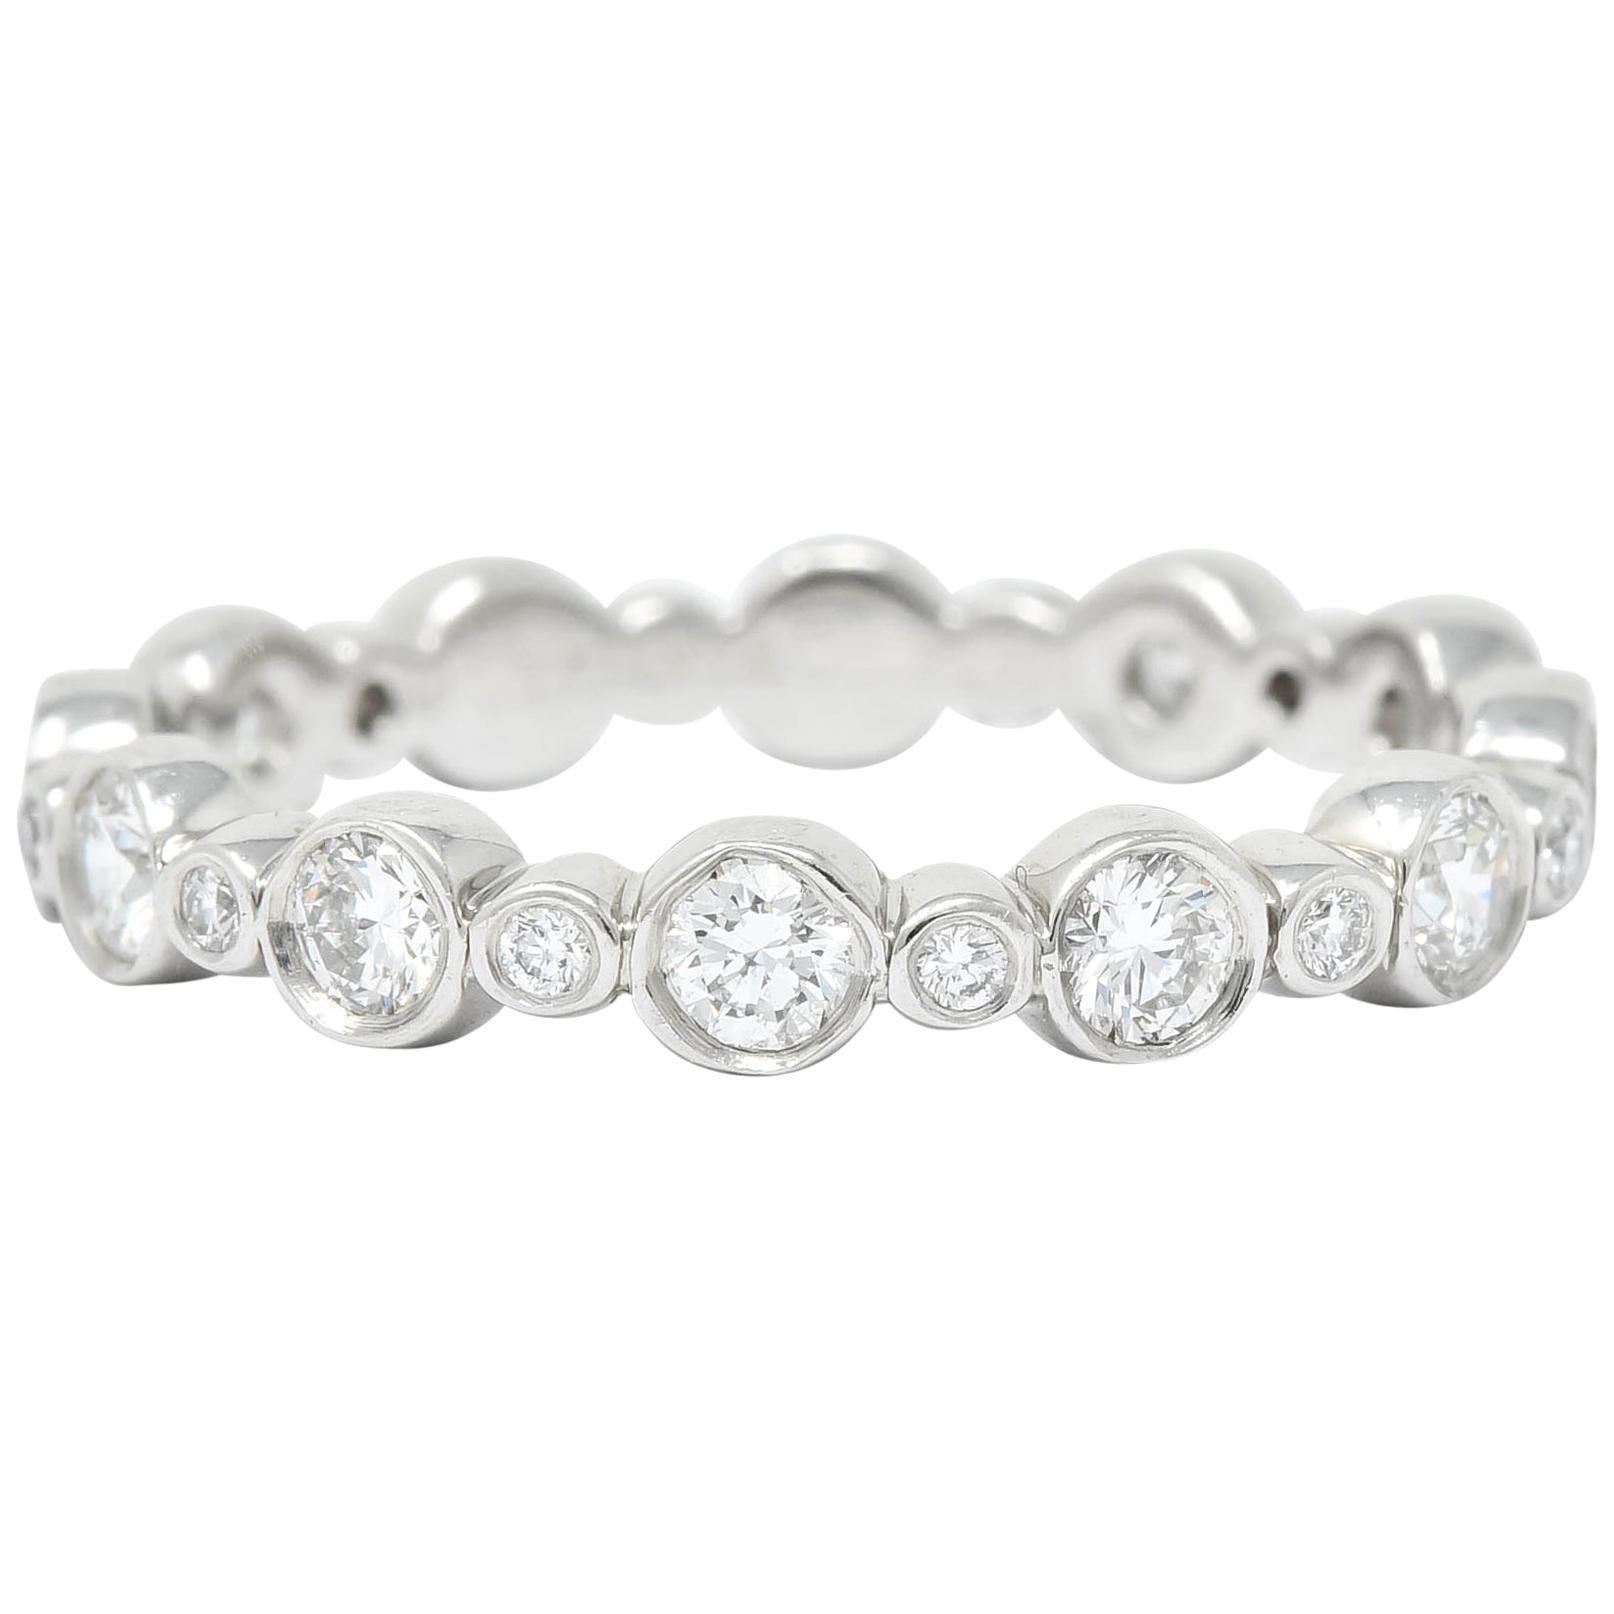 Tiffany & Co. Diamond Platinum Tiffany Jazz Band Stacking Ring